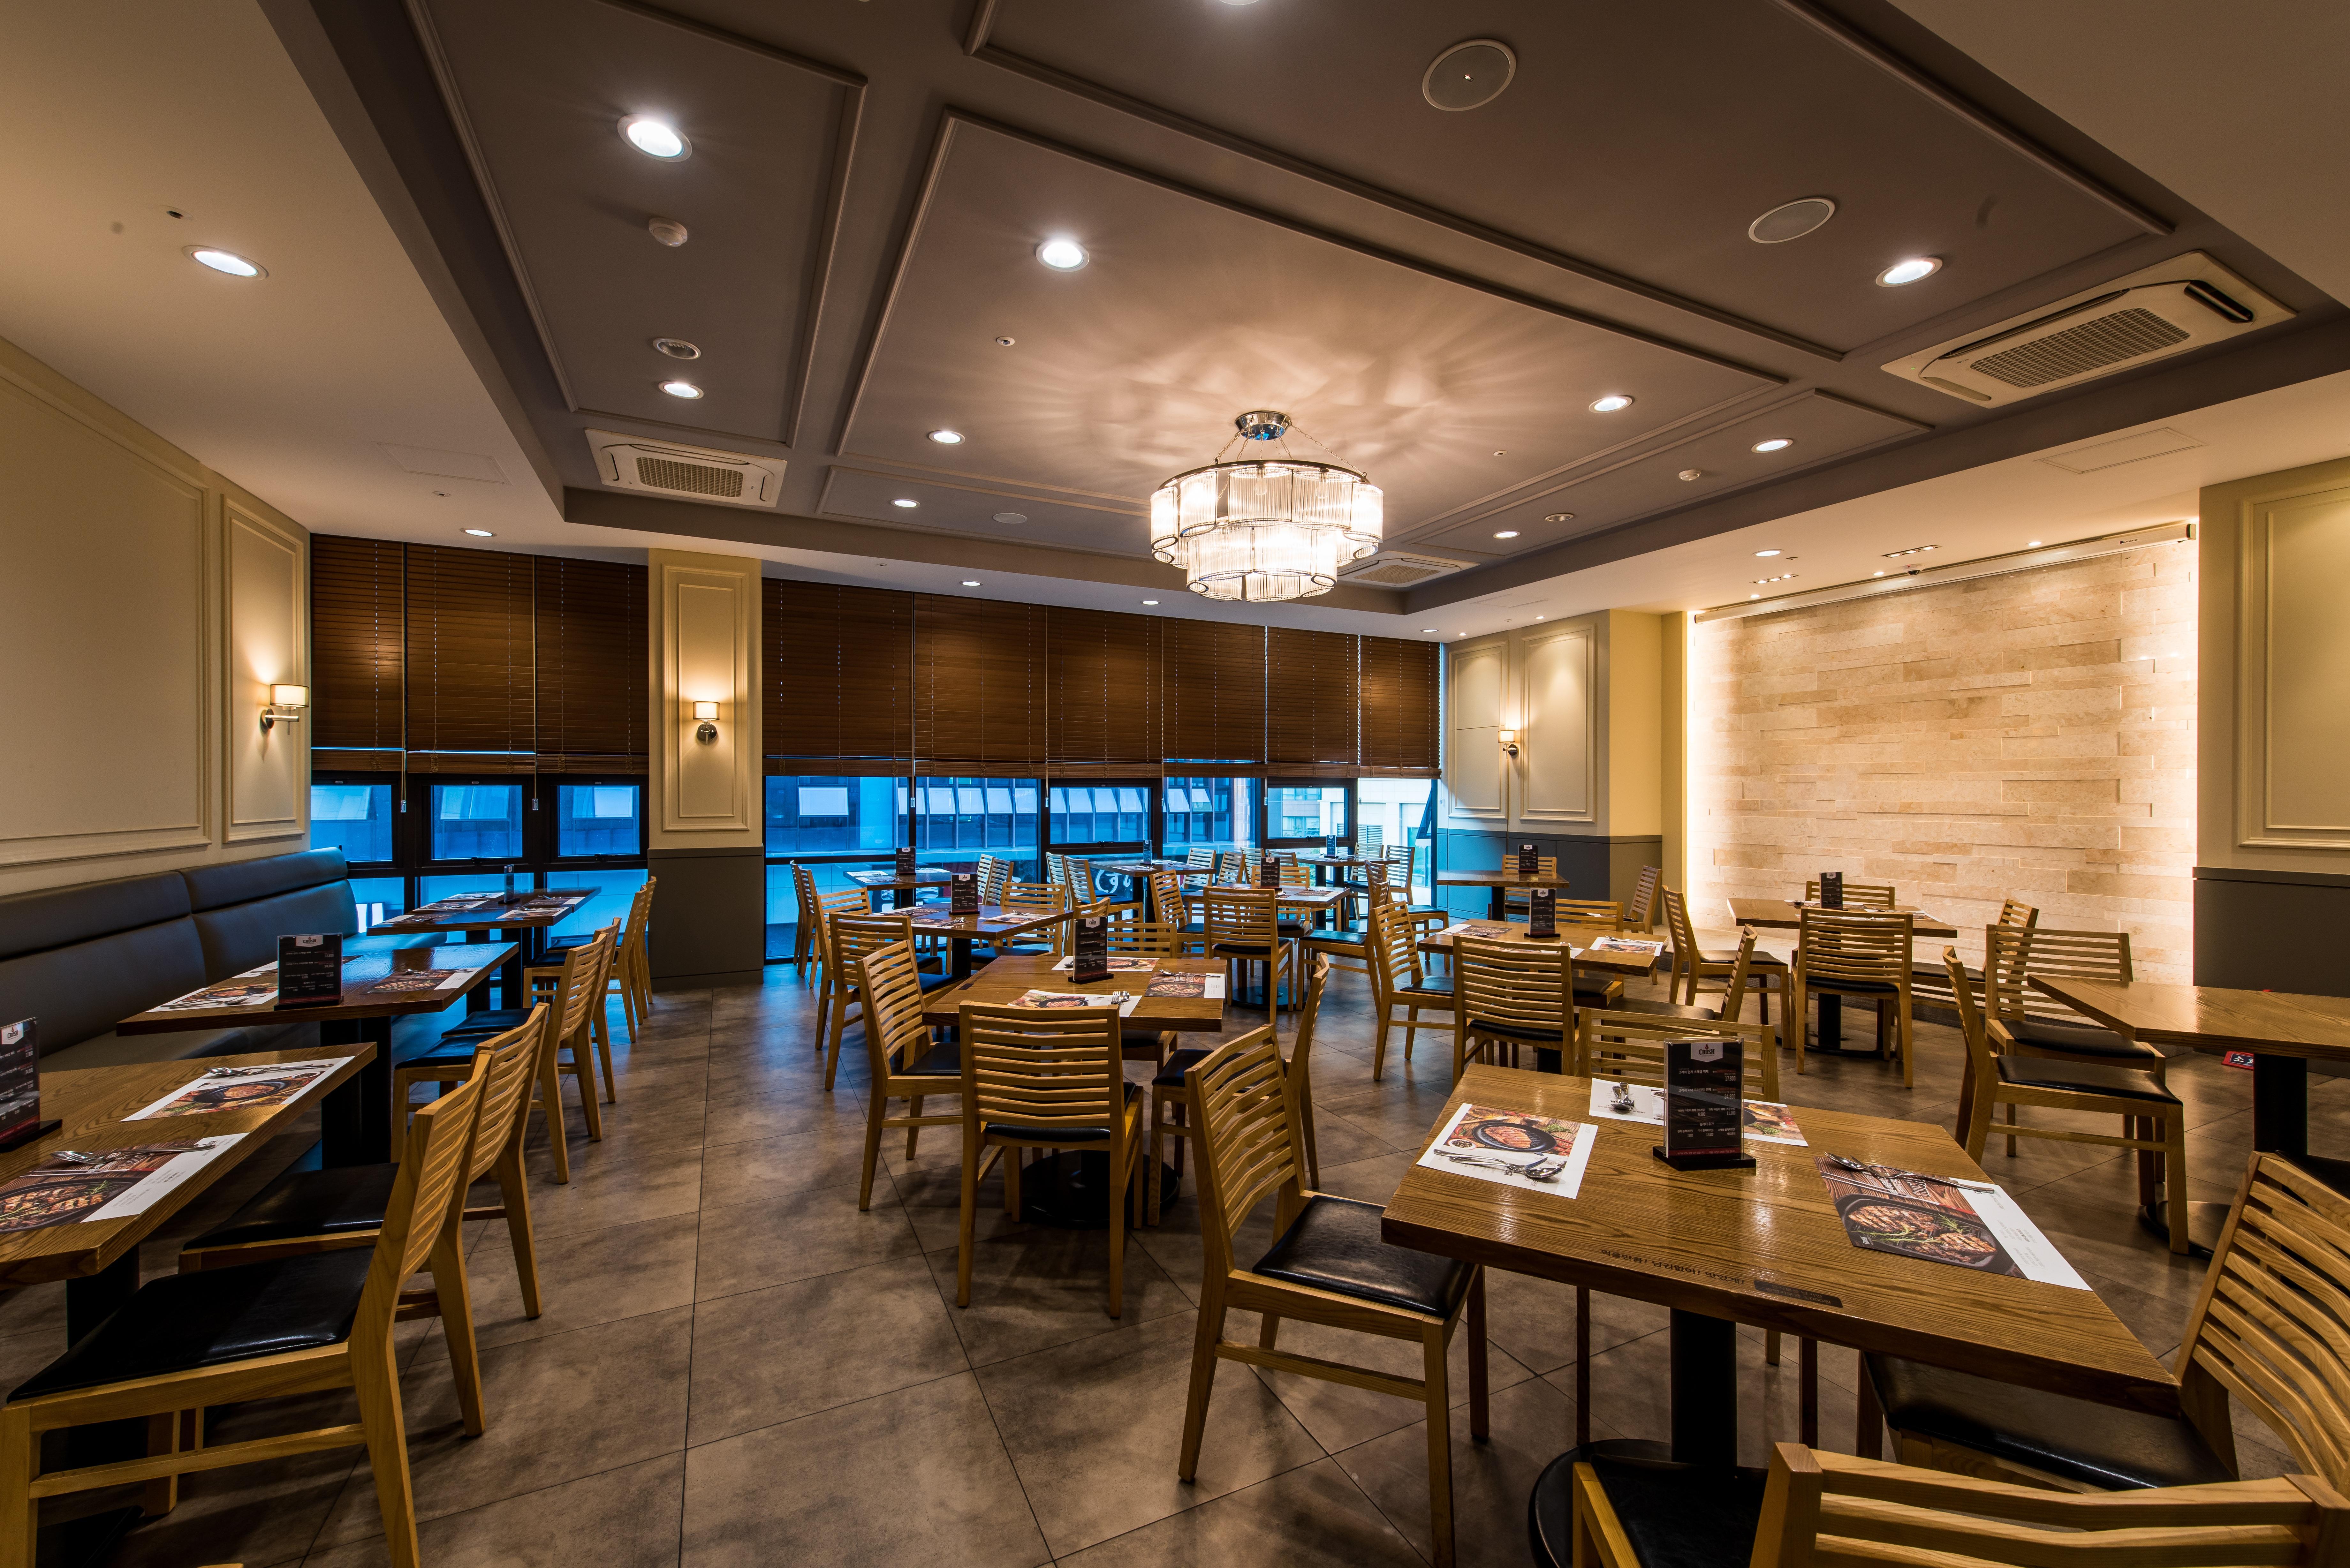 Kostenlose foto : Tabelle, Restaurant, Lebensmittel, Buffet ...